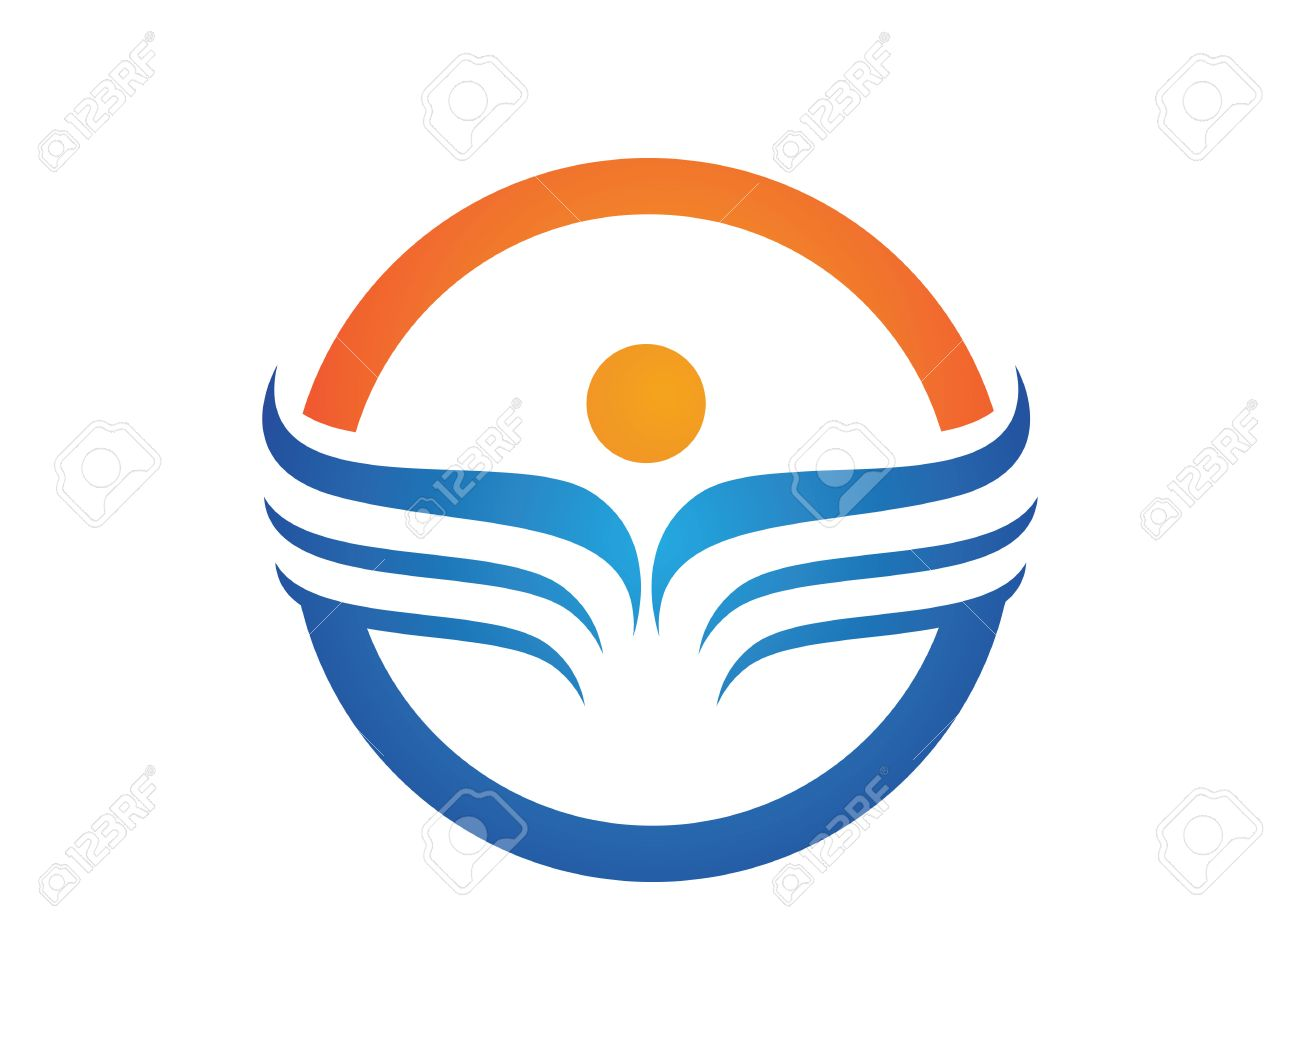 Captivating Home Health Care Logo: Family Care Protection Love Concept Symbol Icon Logo  Design Template Illustration